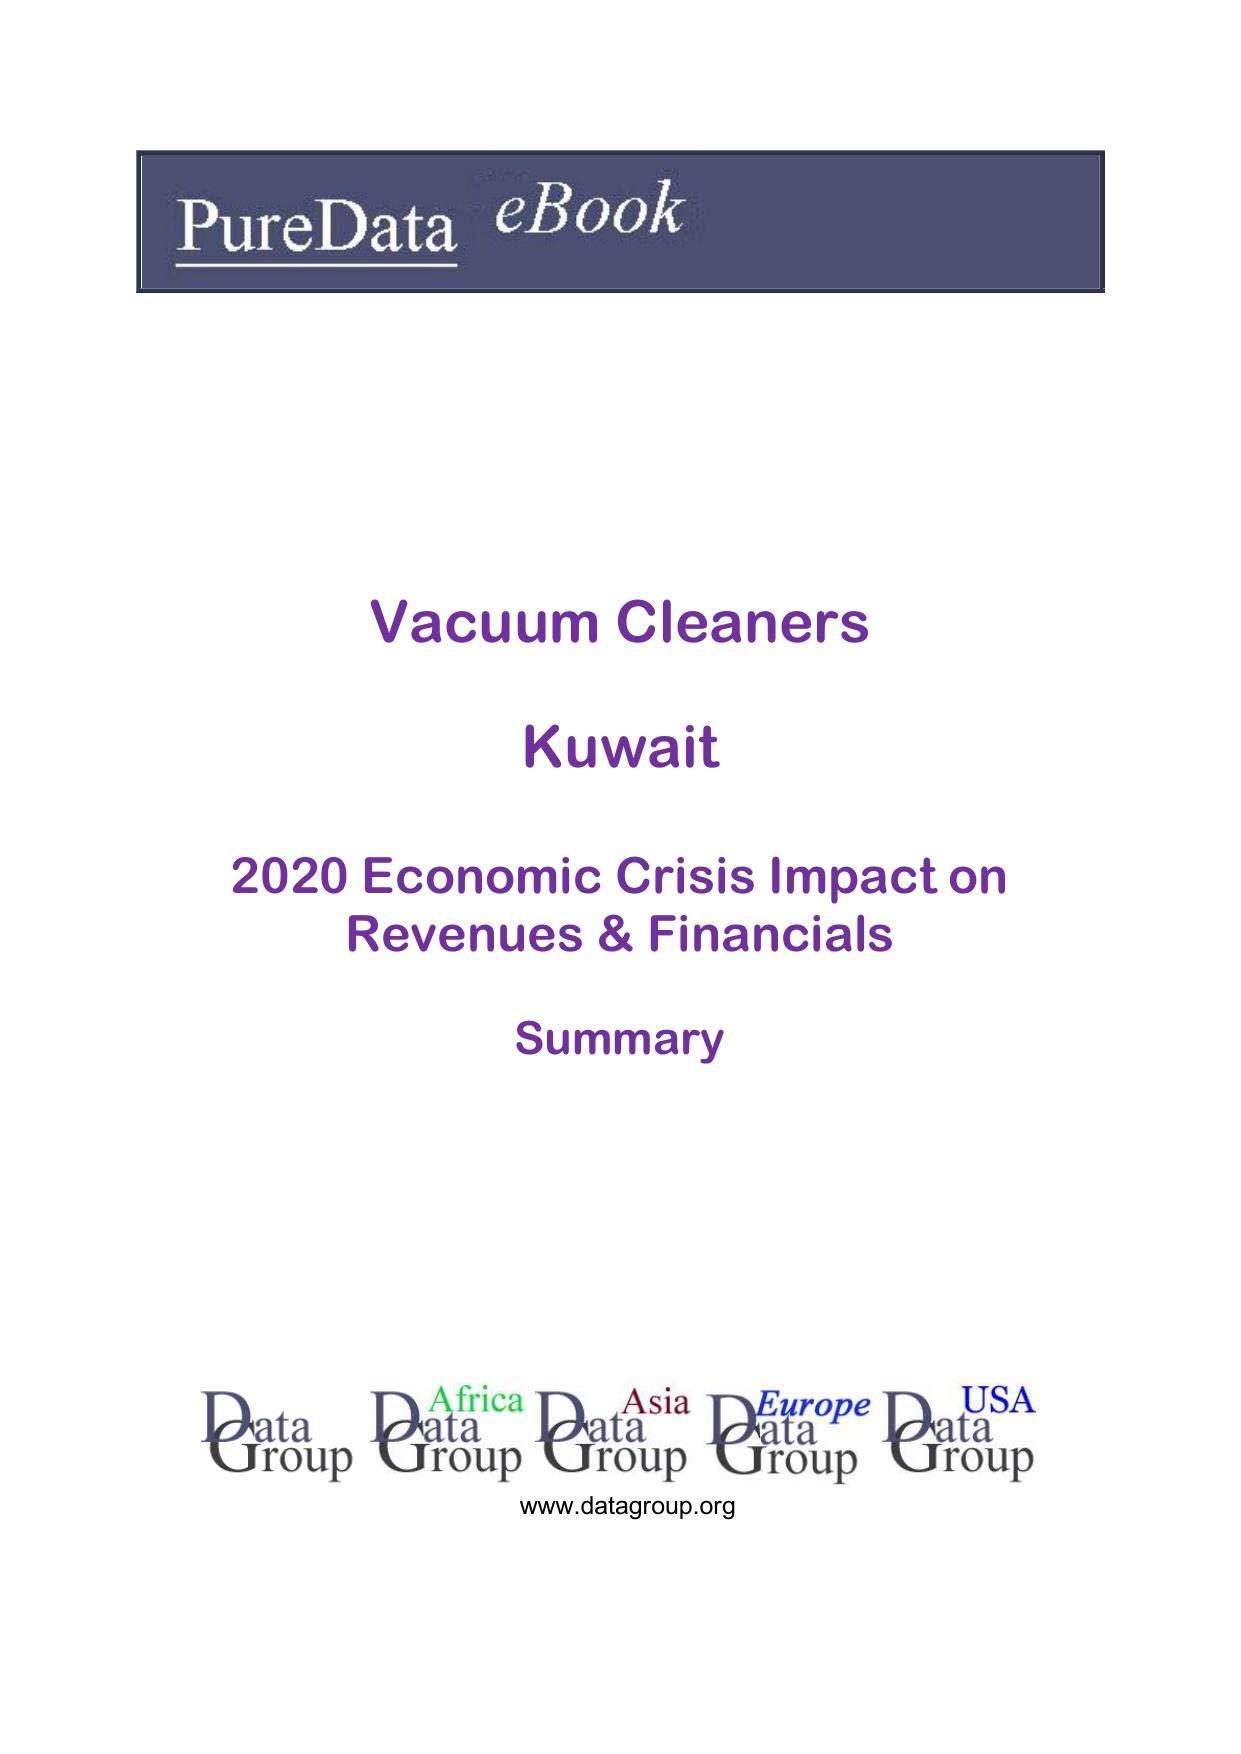 Vacuum Cleaners Kuwait Summary: 2020 Economic Crisis Impact on Revenues & Financials